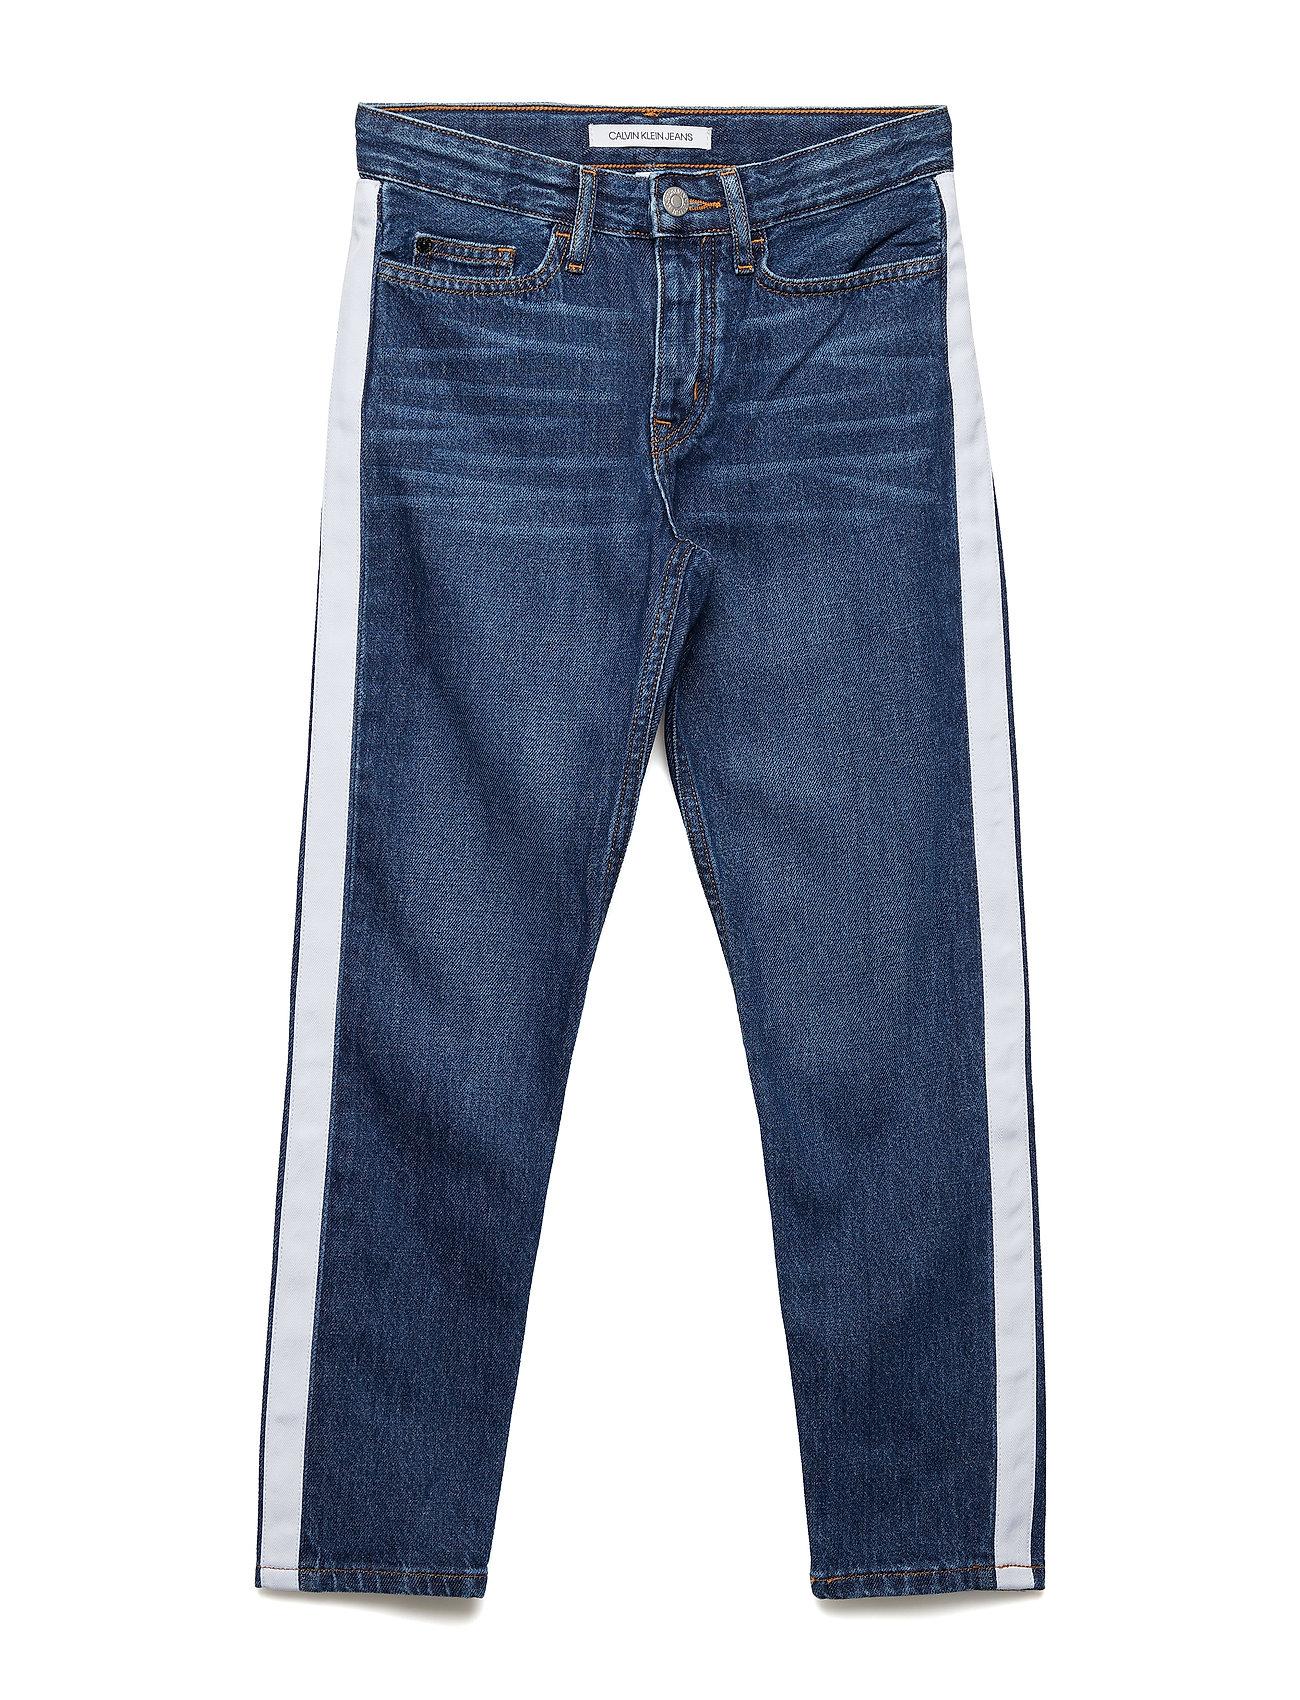 Calvin Klein BOYFRIEND IZON MID B - IZON MID BLUE RIGID